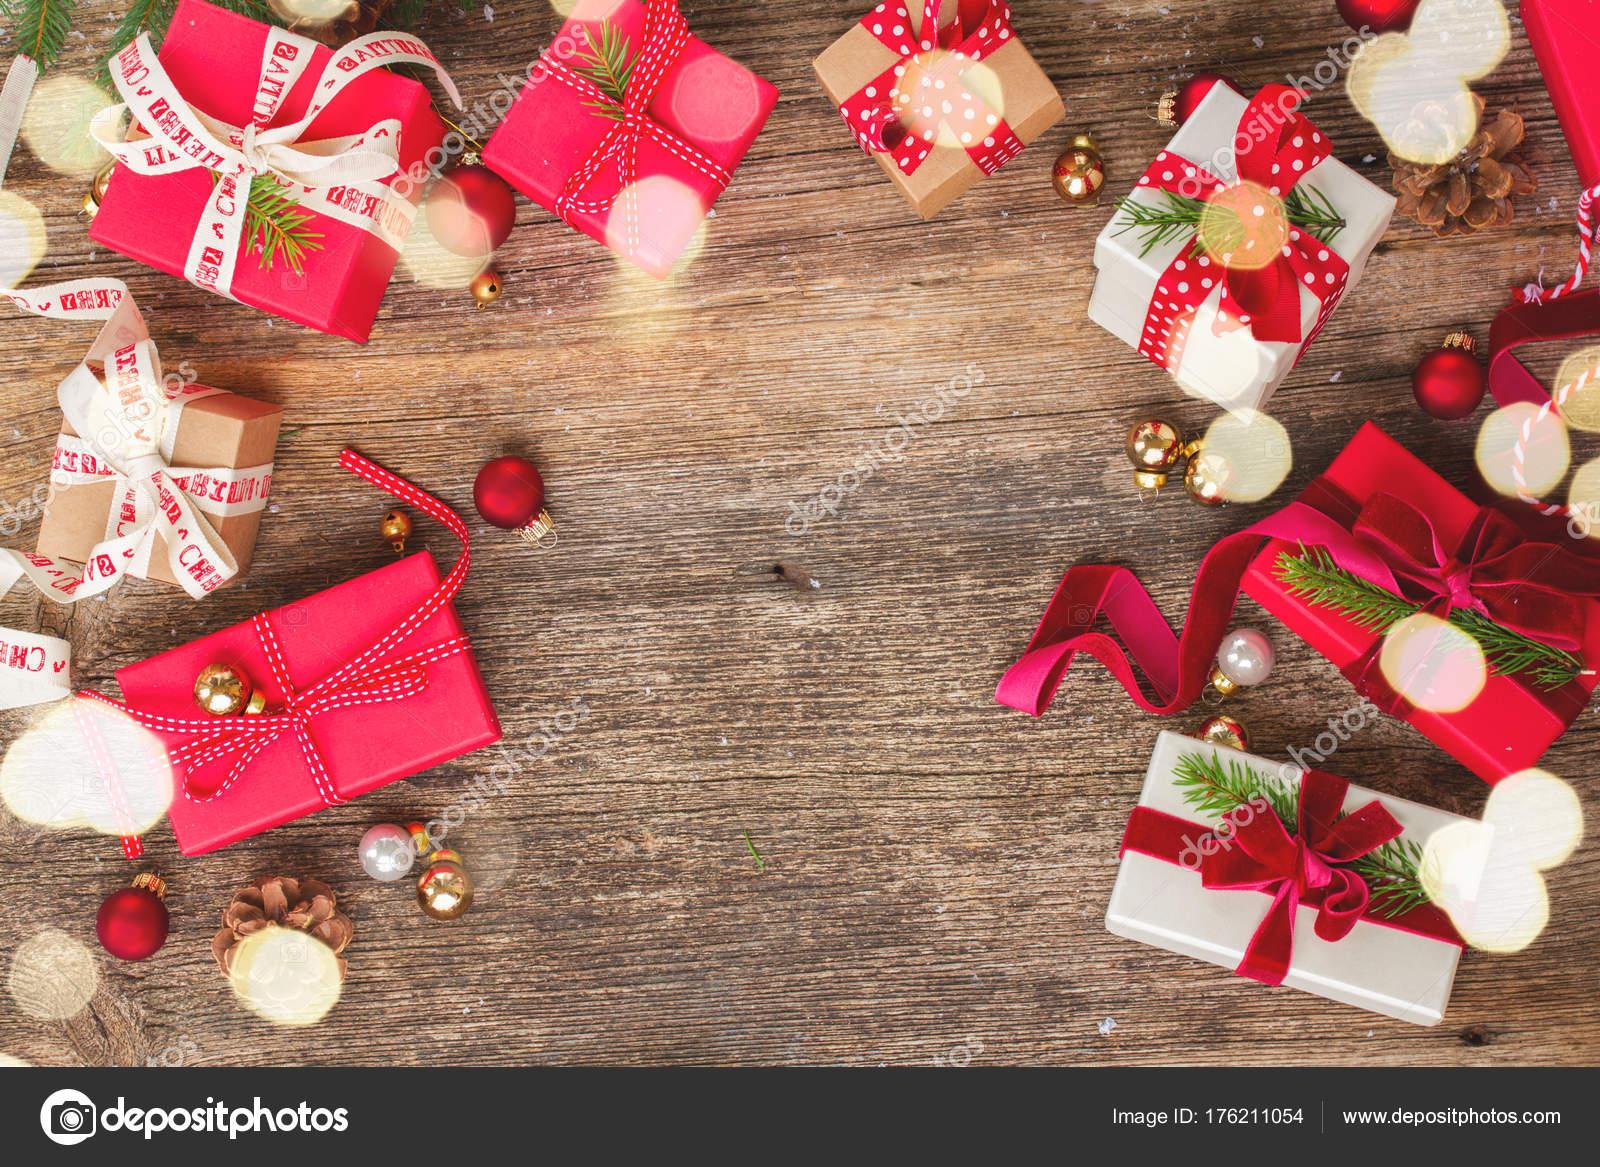 Christmas Gift Giving Images.Christmas Gift Giving Stock Photo C Neirfys 176211054